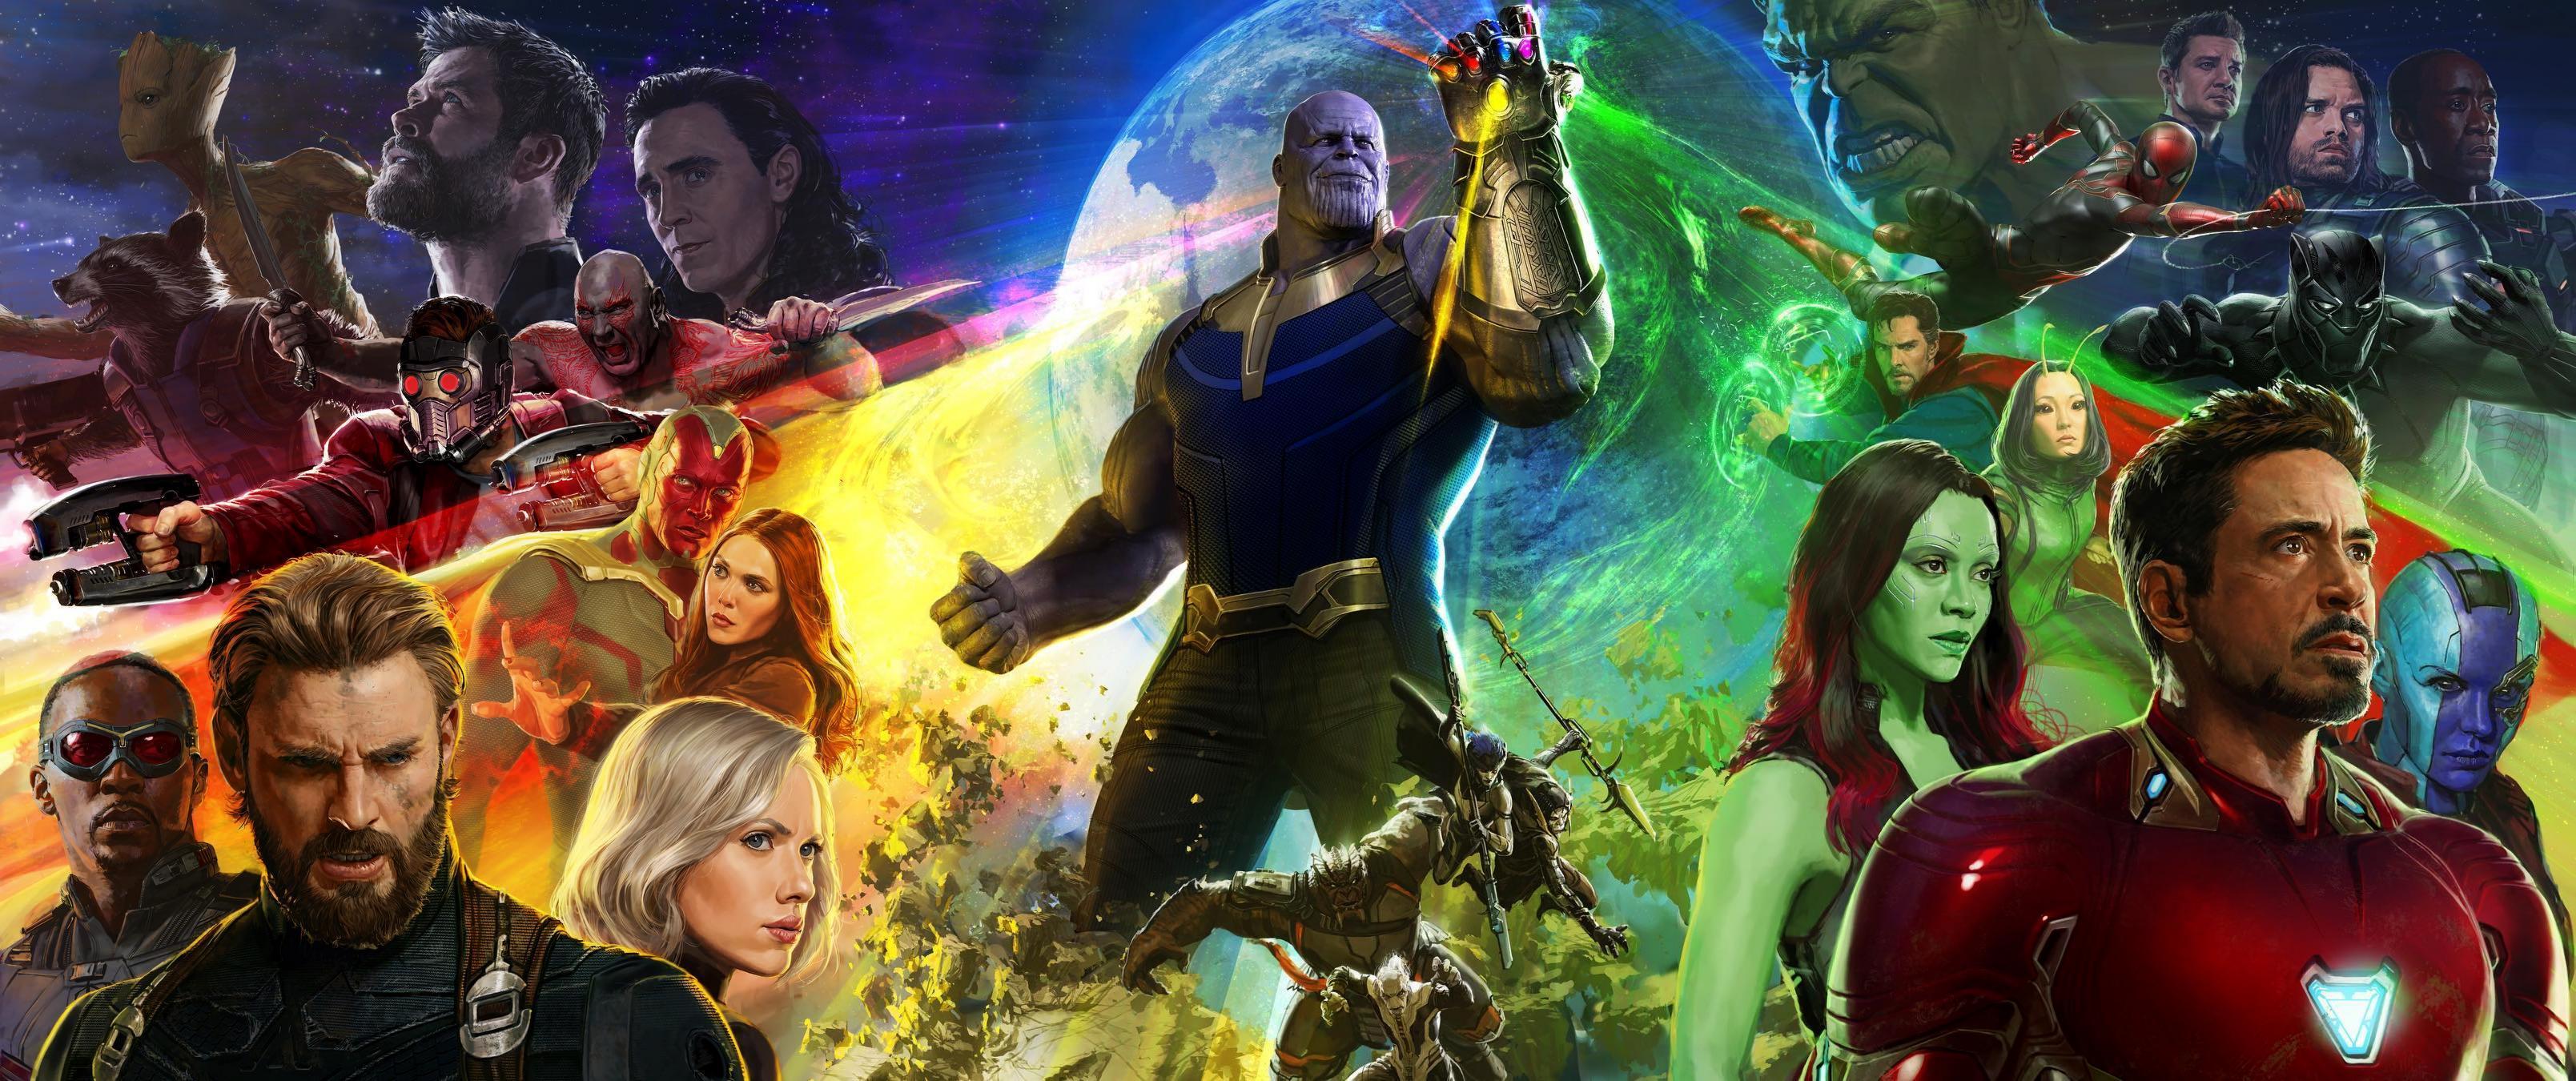 Avengers Infinity War 2018 4k - Avengers Infinity War 2018 4k - thanos-wallpapers, infinity-war-wallpapers, hd-wallpapers, avengers-wallpapers, avengers-infinity-war-wallpapers, 4k-wallpapers, 2018-movies-wallpapers